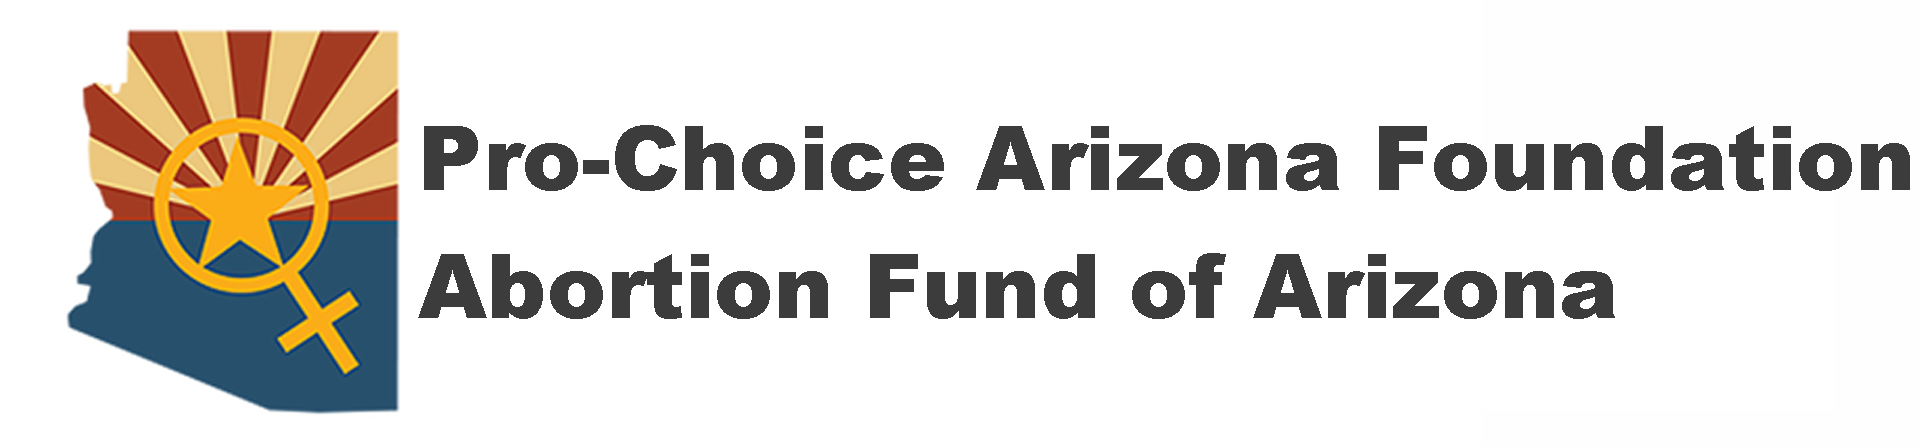 Pro-Choice Arizona Foundation